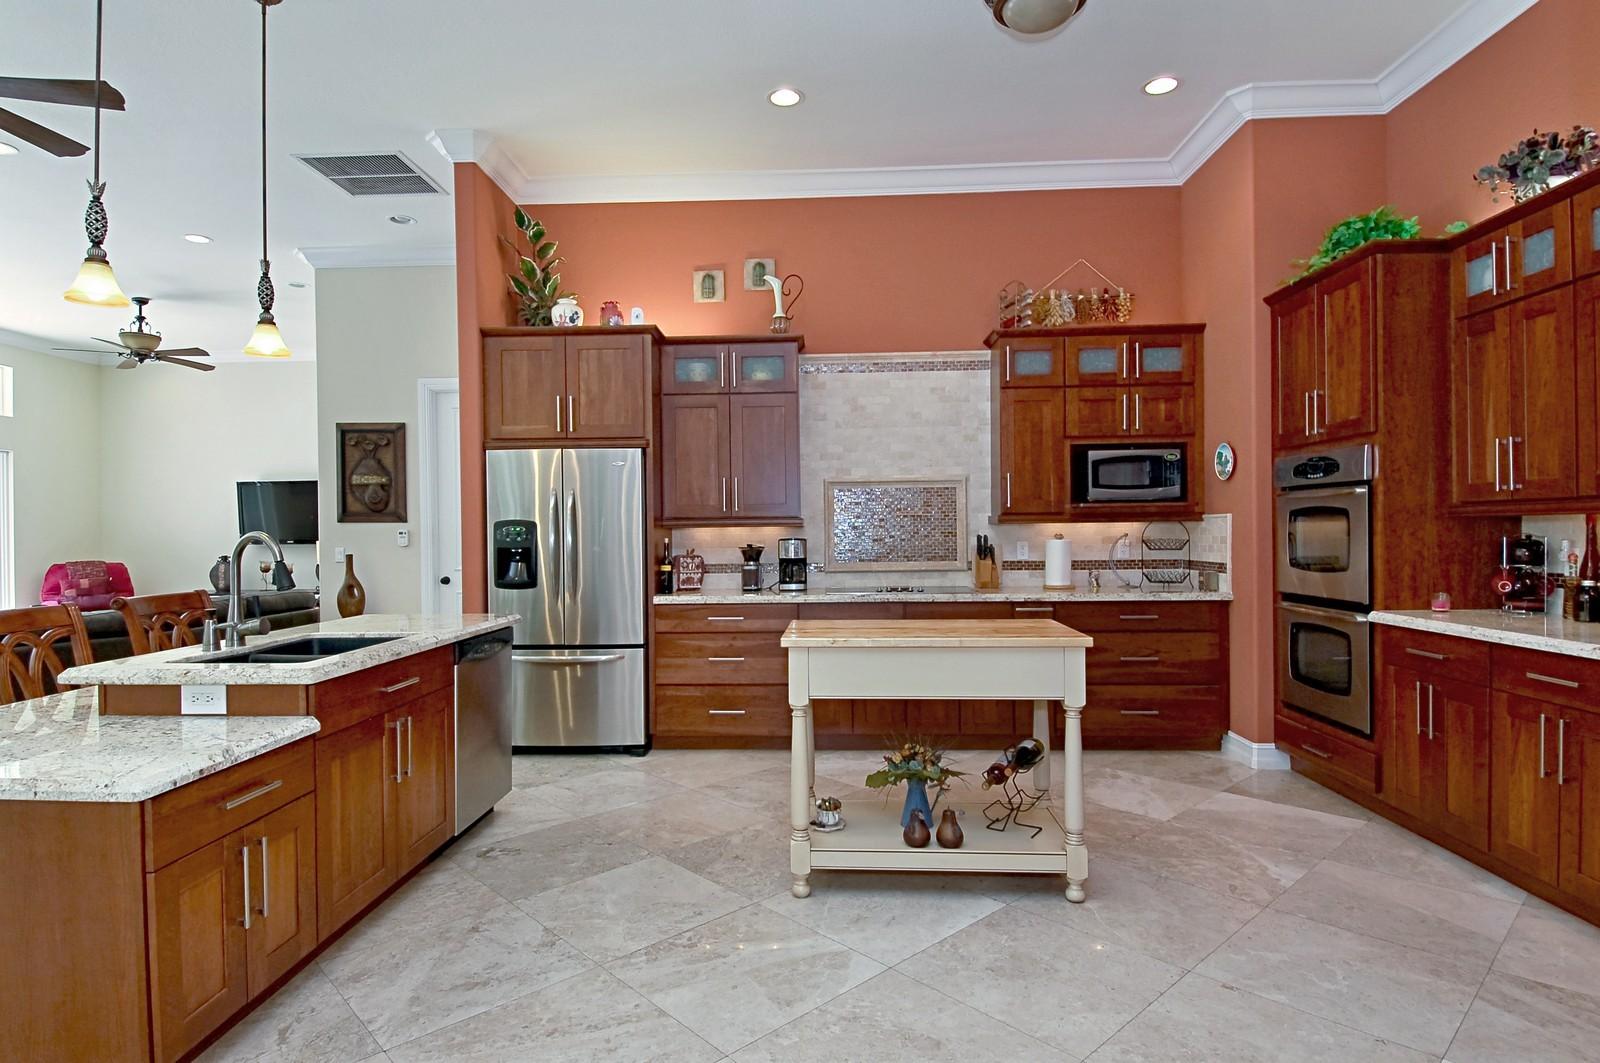 Real Estate Photography - 5400 Woodlanden Ln, Ft Lauderdale, FL, 33021 - Kitchen